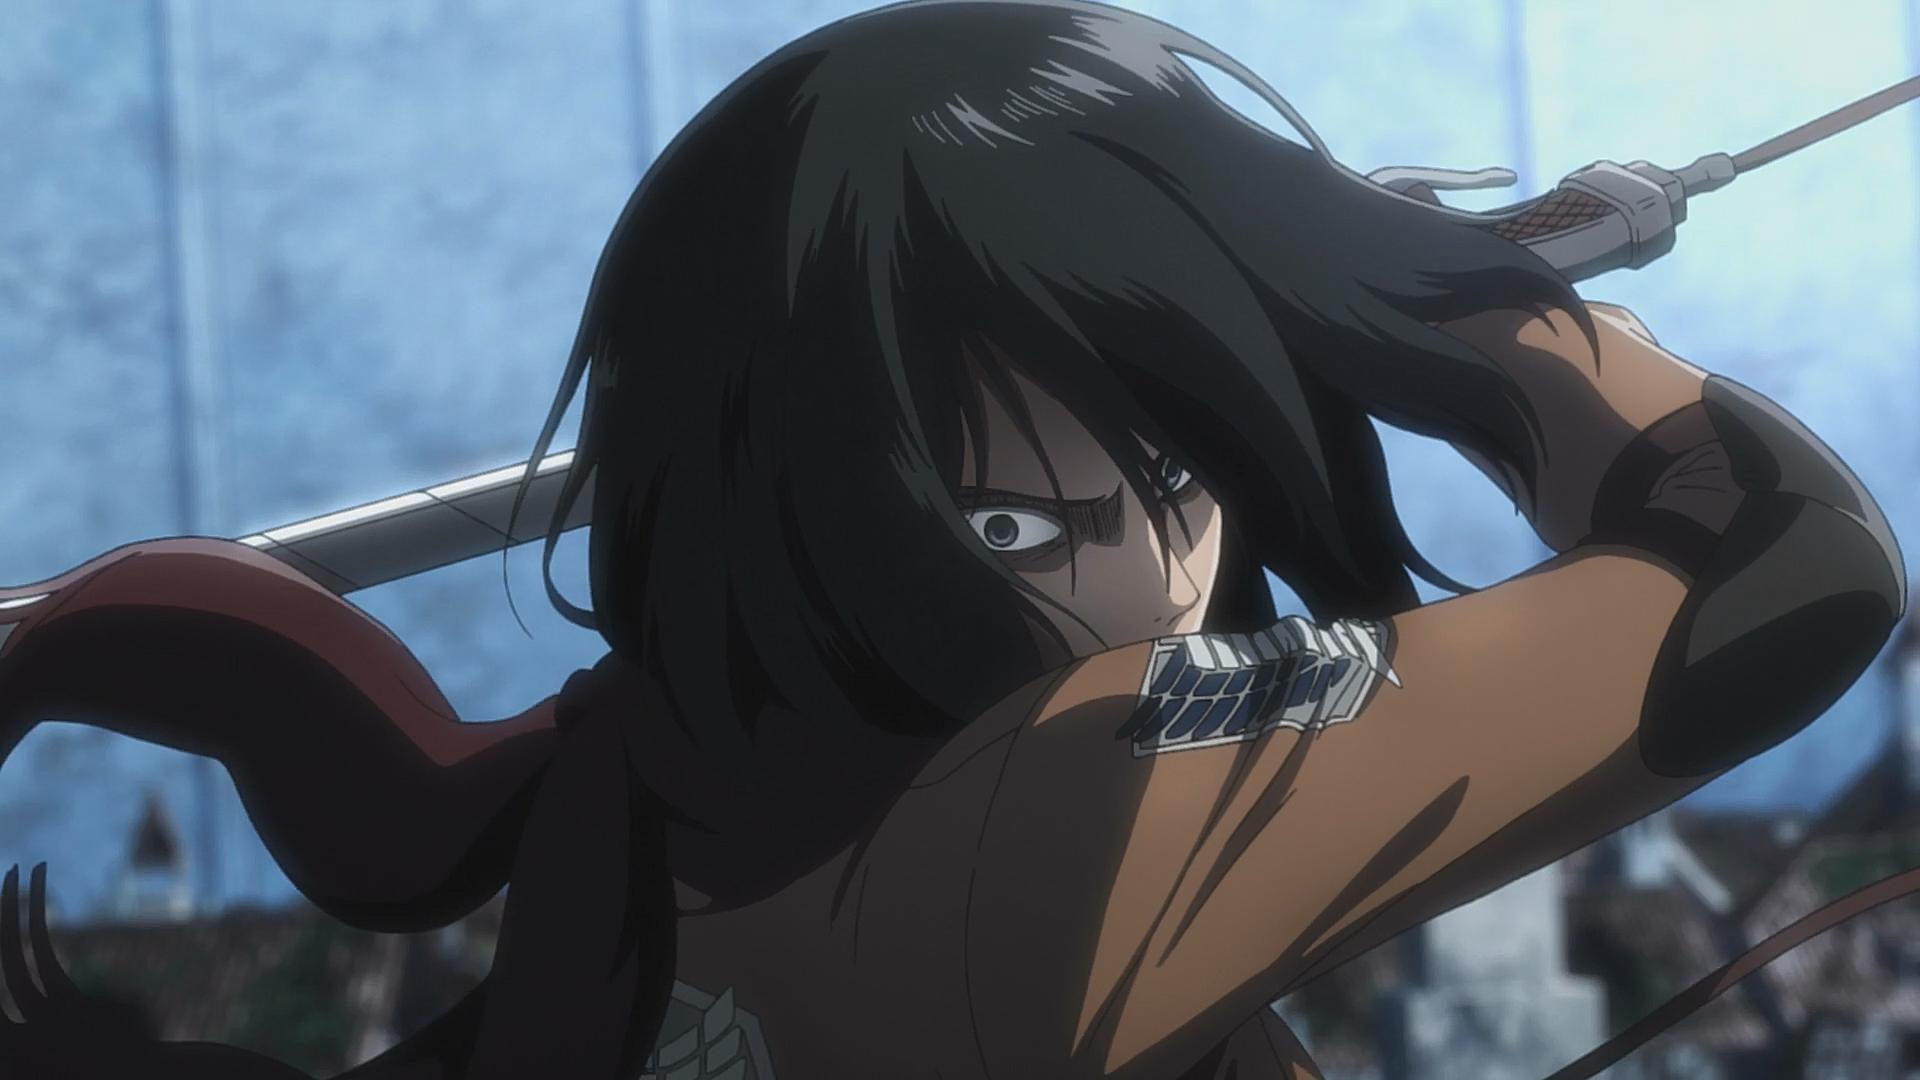 Mikasa greift Berthold von hinten an.png